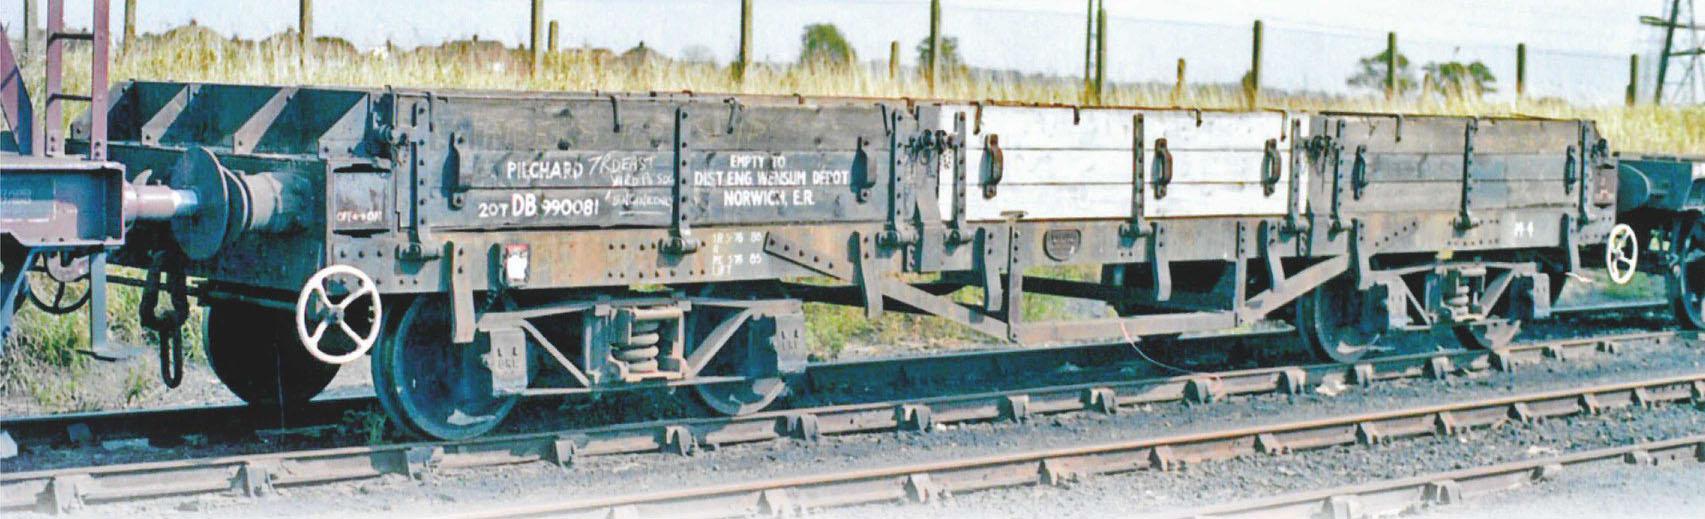 DB990081. Date unknown. ©via Oxford Rail